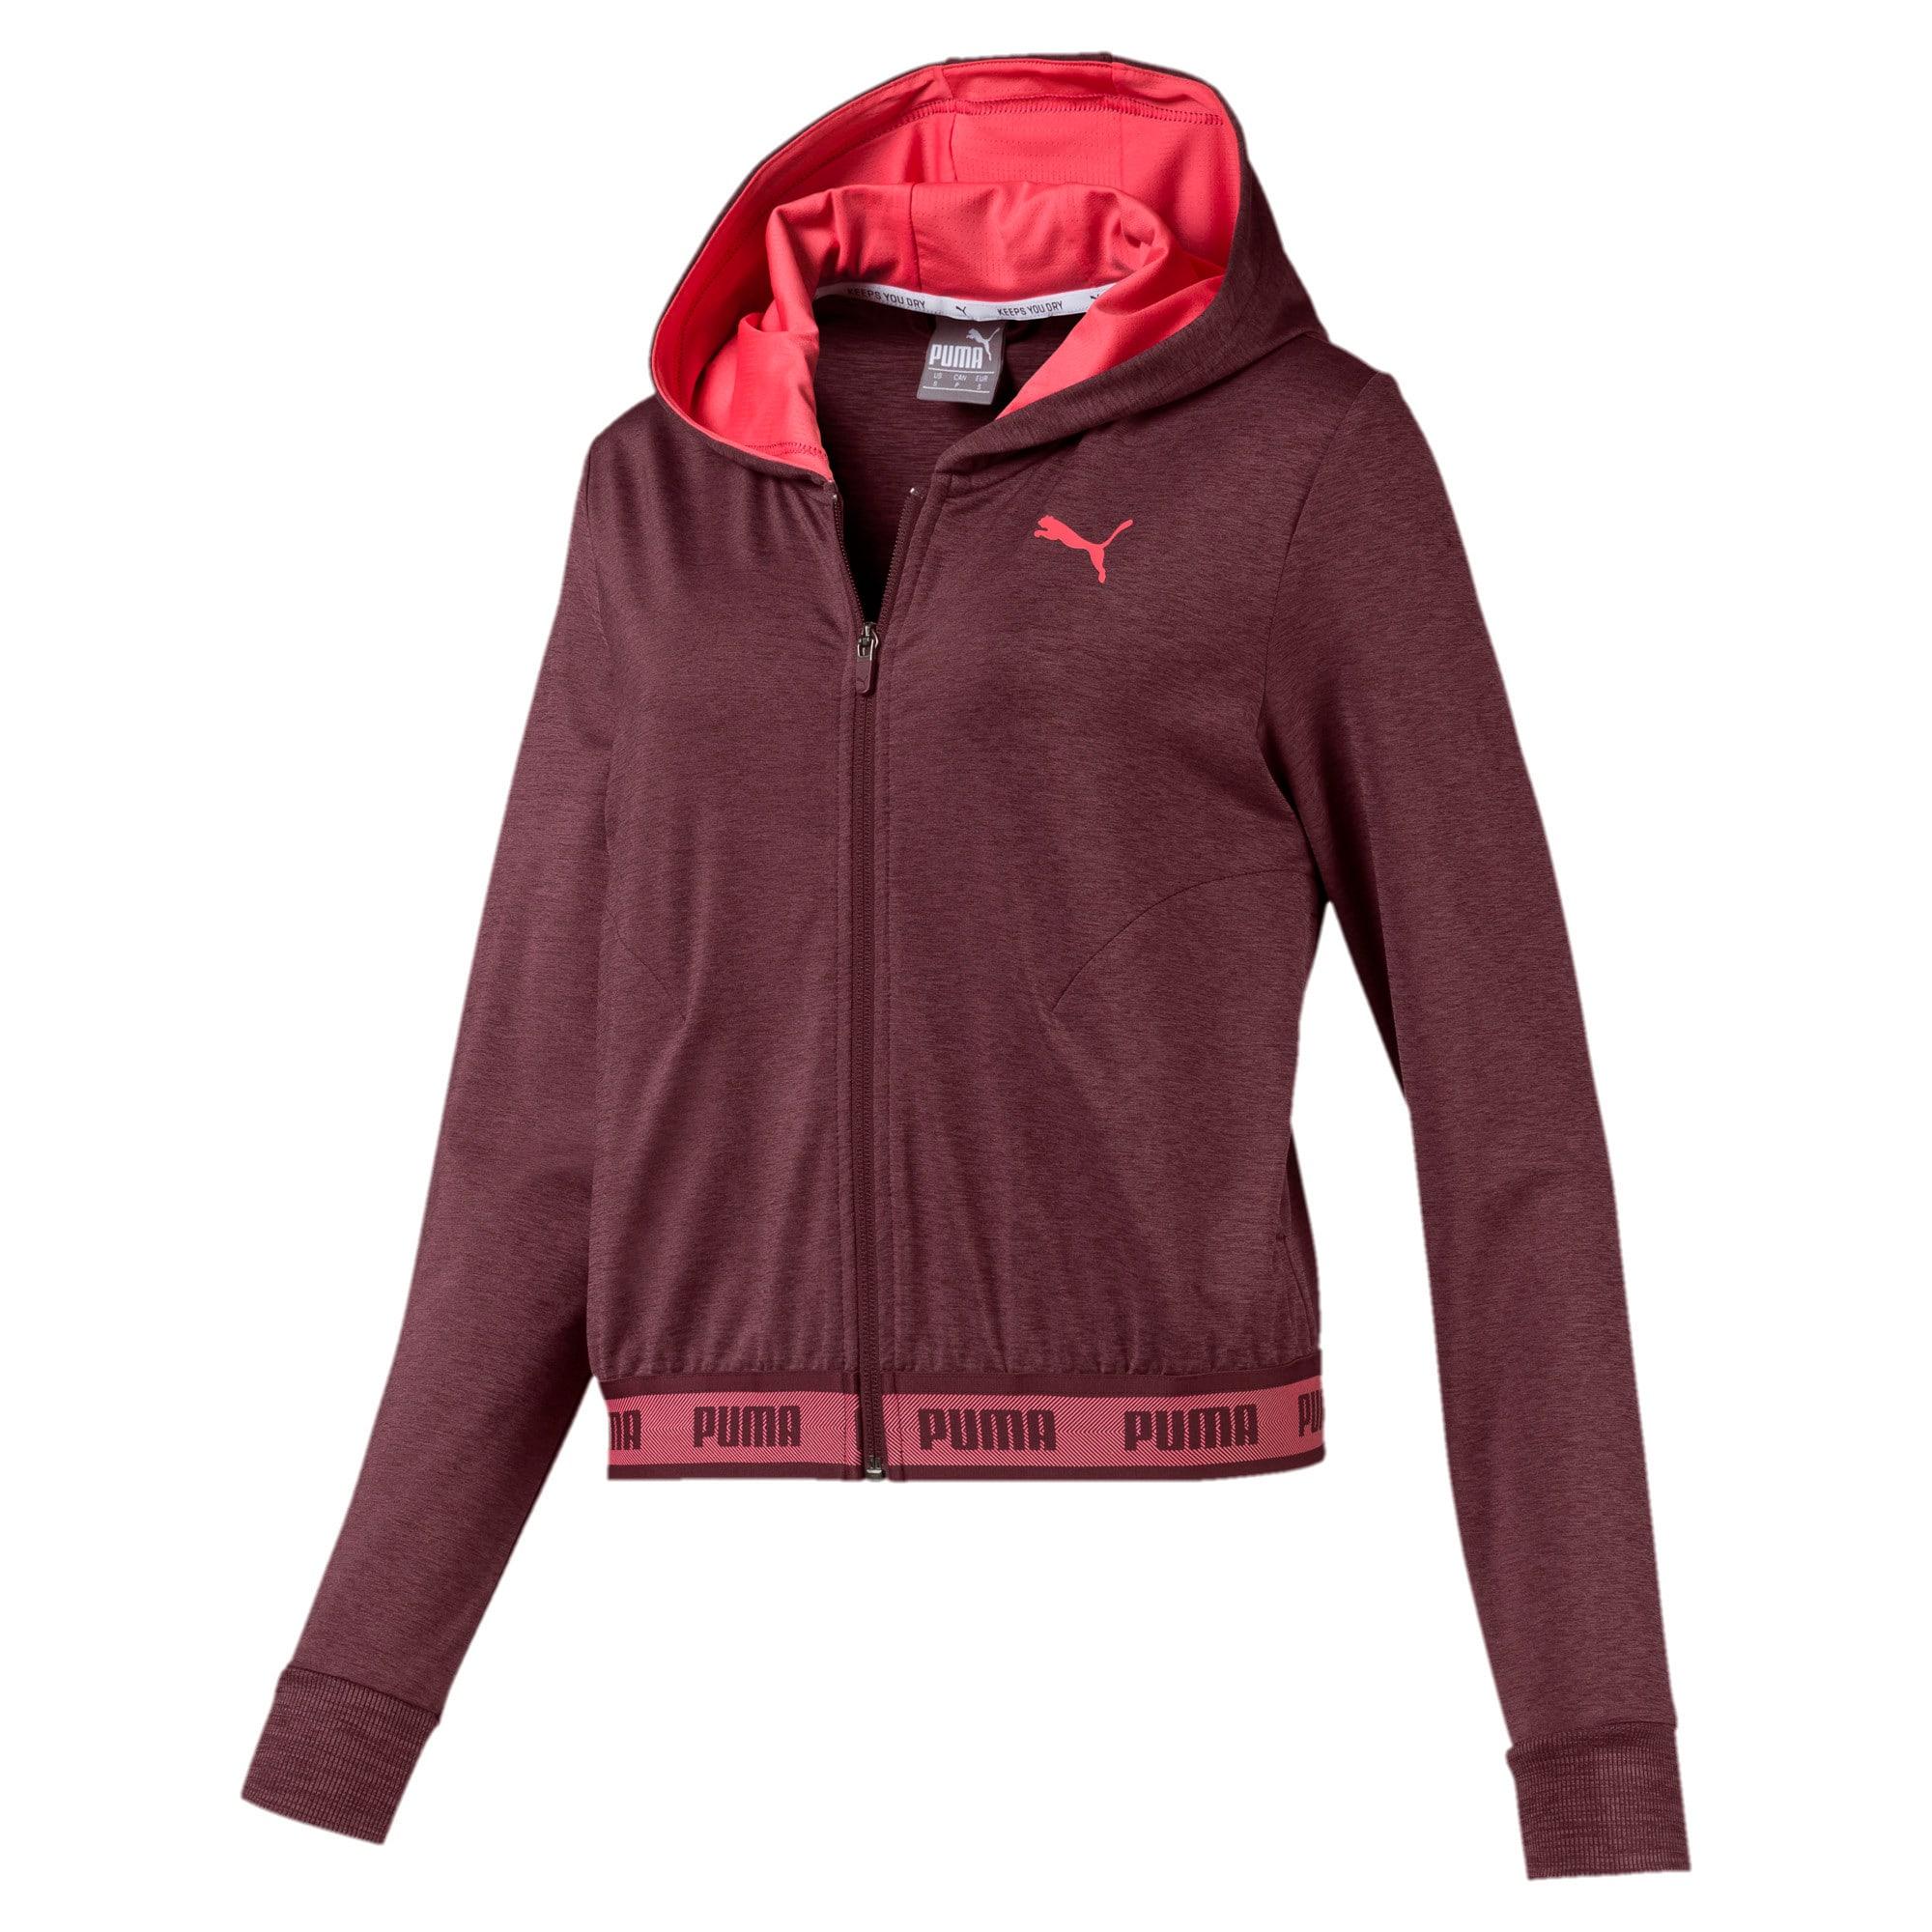 Thumbnail 4 of SOFT SPORTS Hooded Women's Sweat Jacket, Vineyard Wine Heather, medium-IND